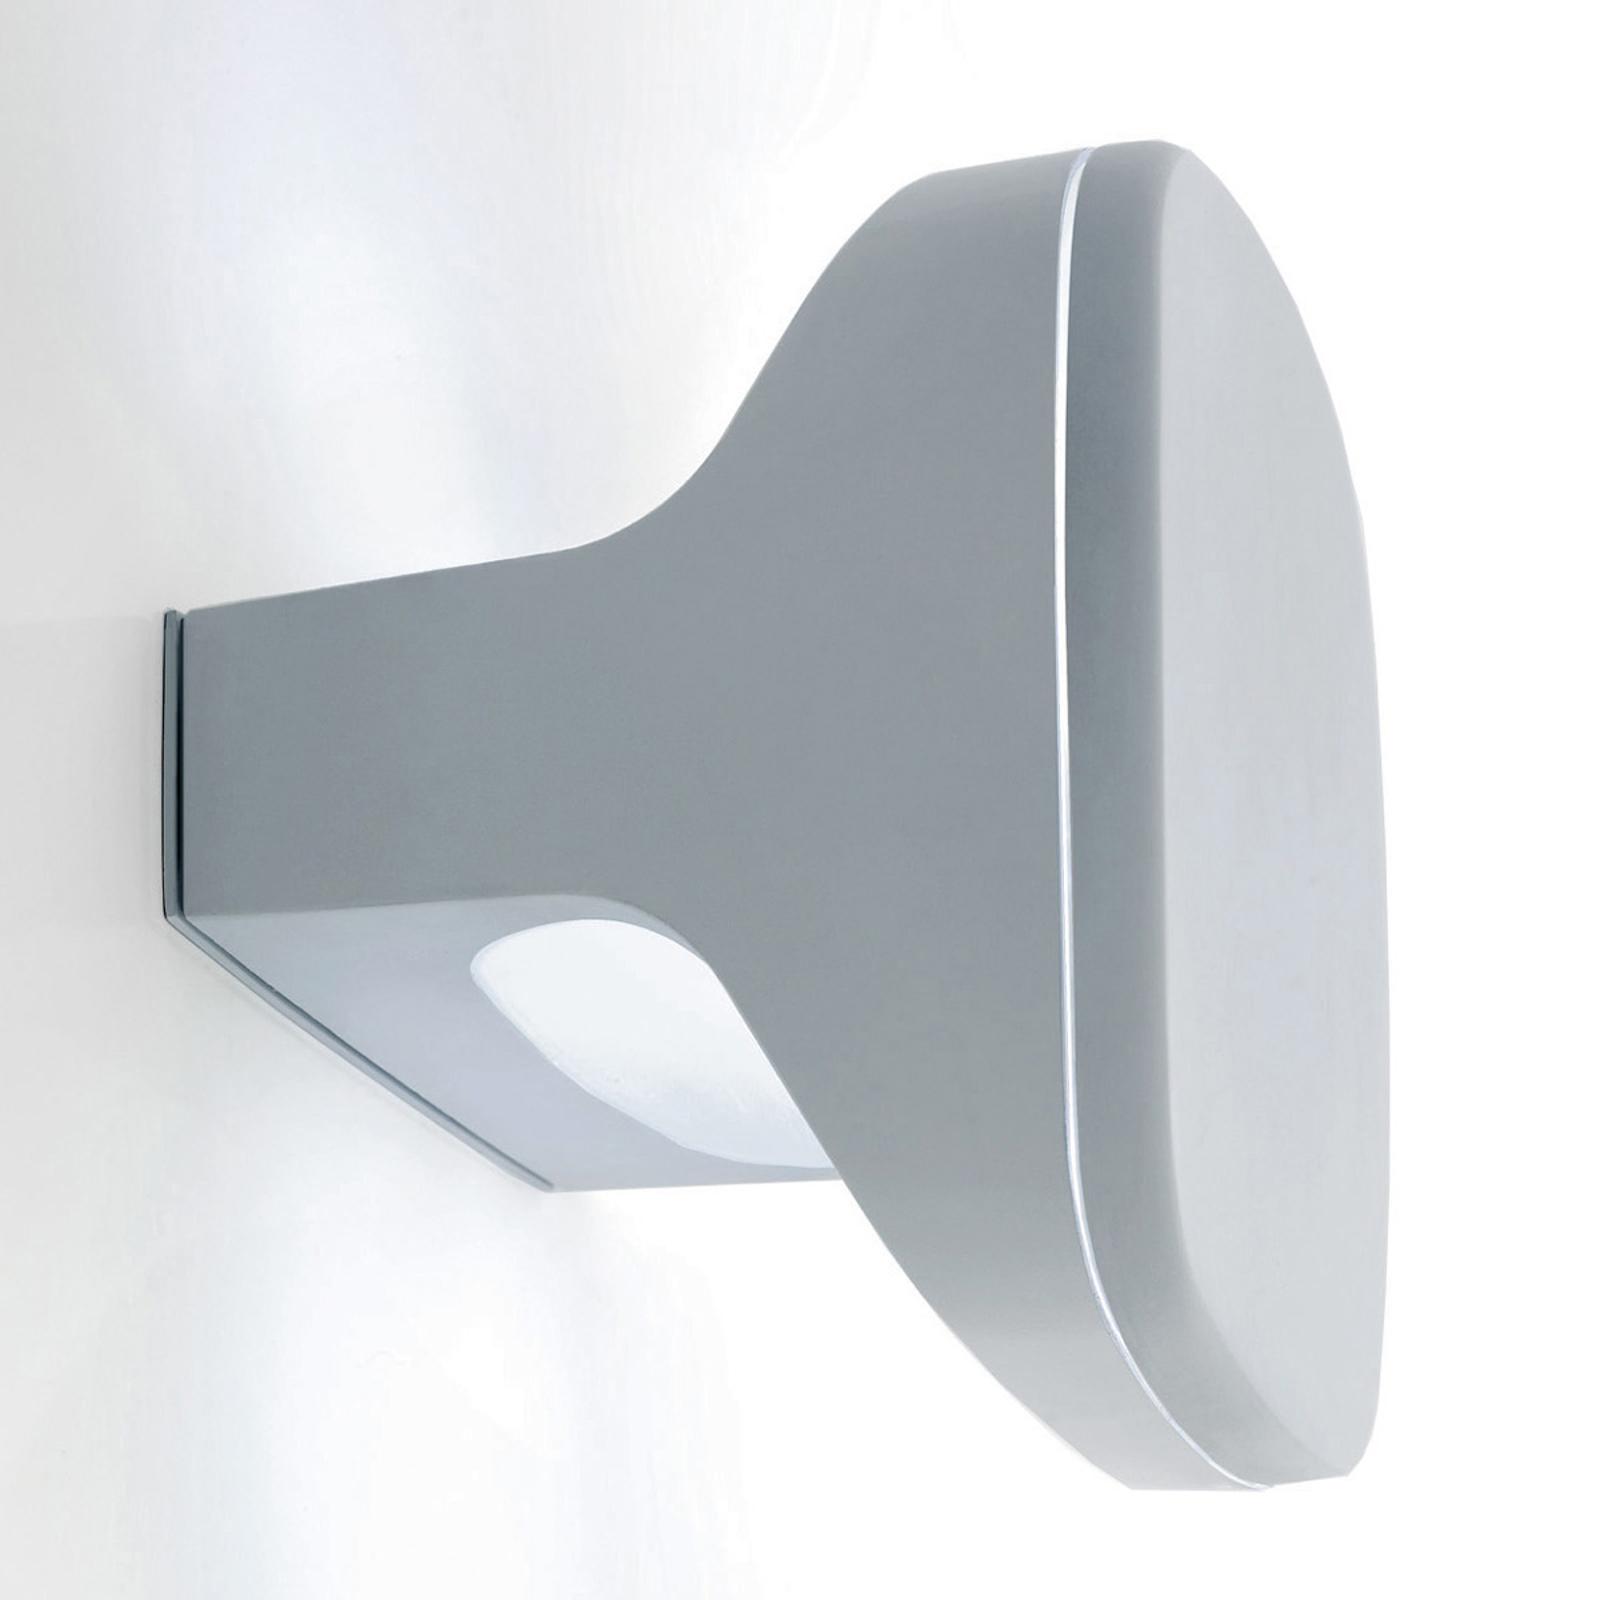 Applique extérieure LED ultra moderne Sky, alu